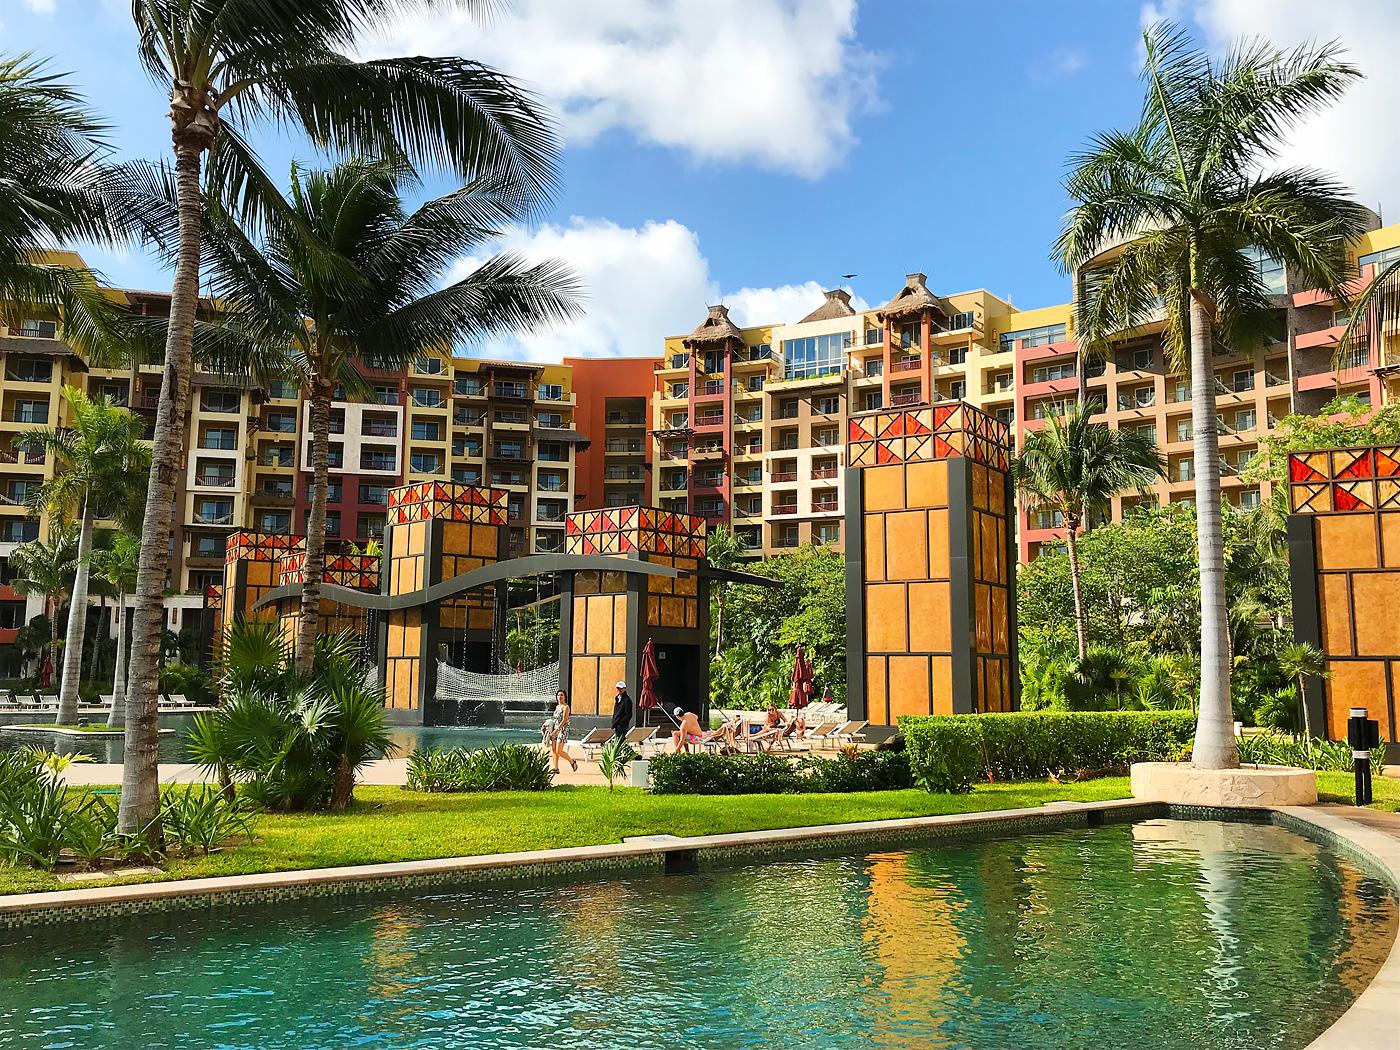 Villa Del Palmar - Cancun Luxury Travel - Resort Review